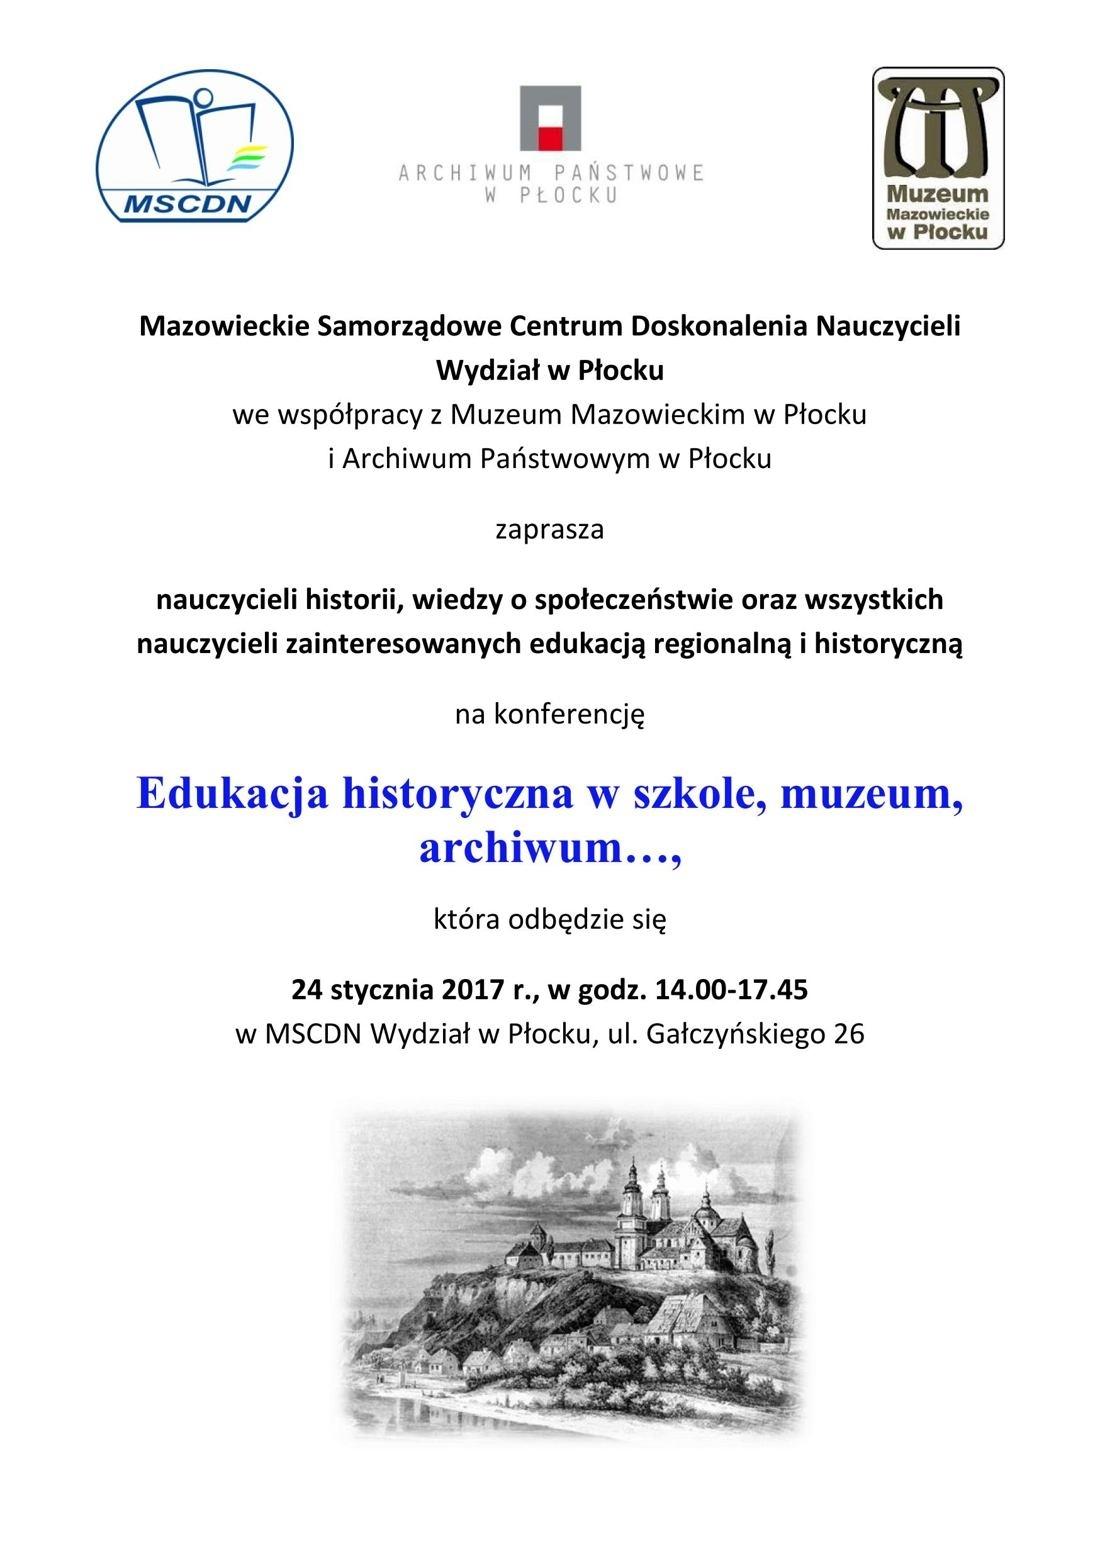 mscdn_konferencja-historyczna